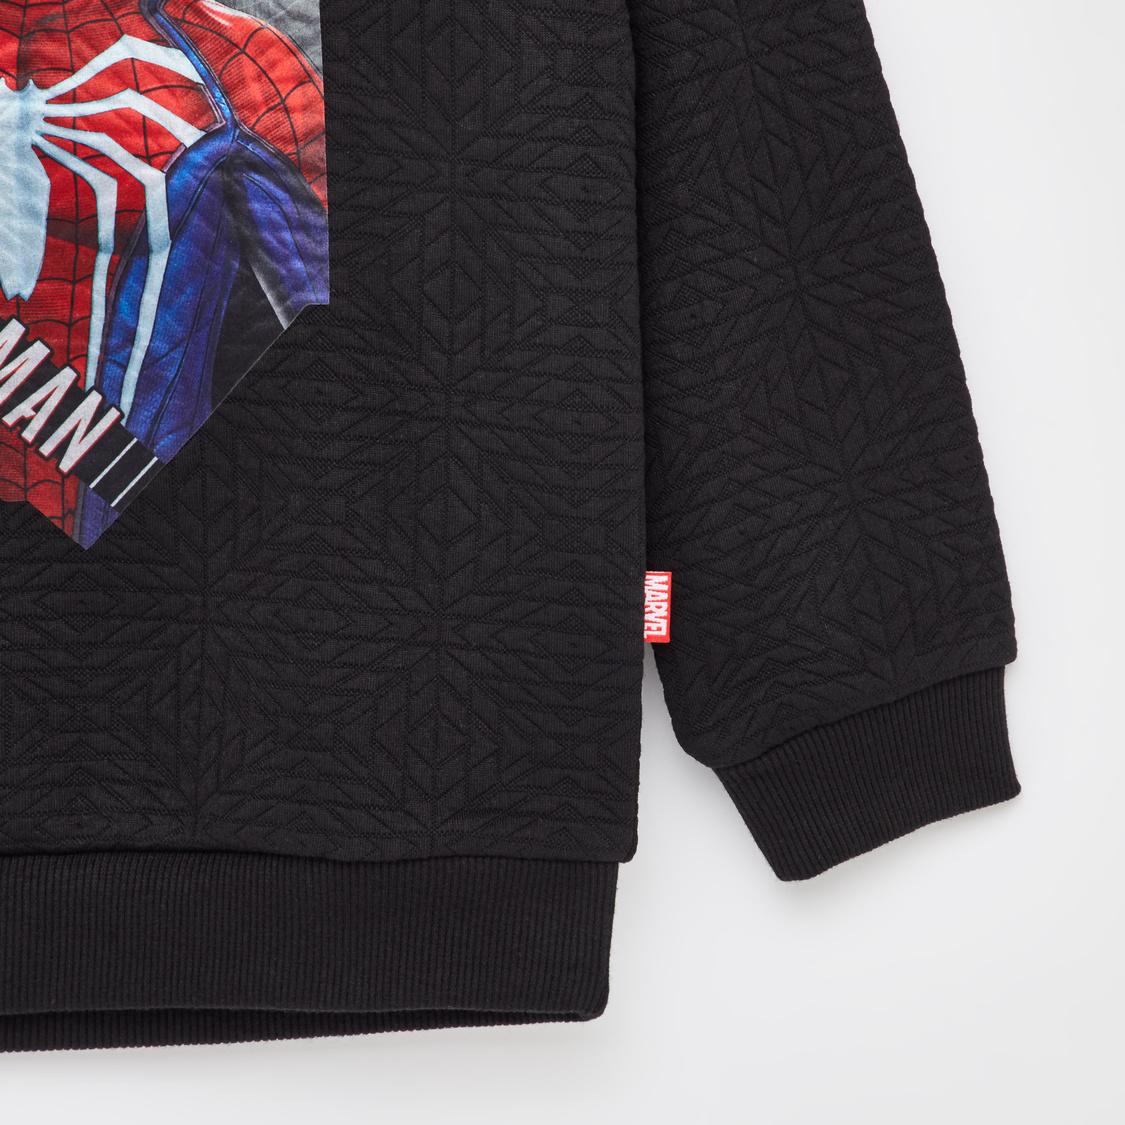 Spider-Man Print Round Neck Sweatshirt with Long Sleeves